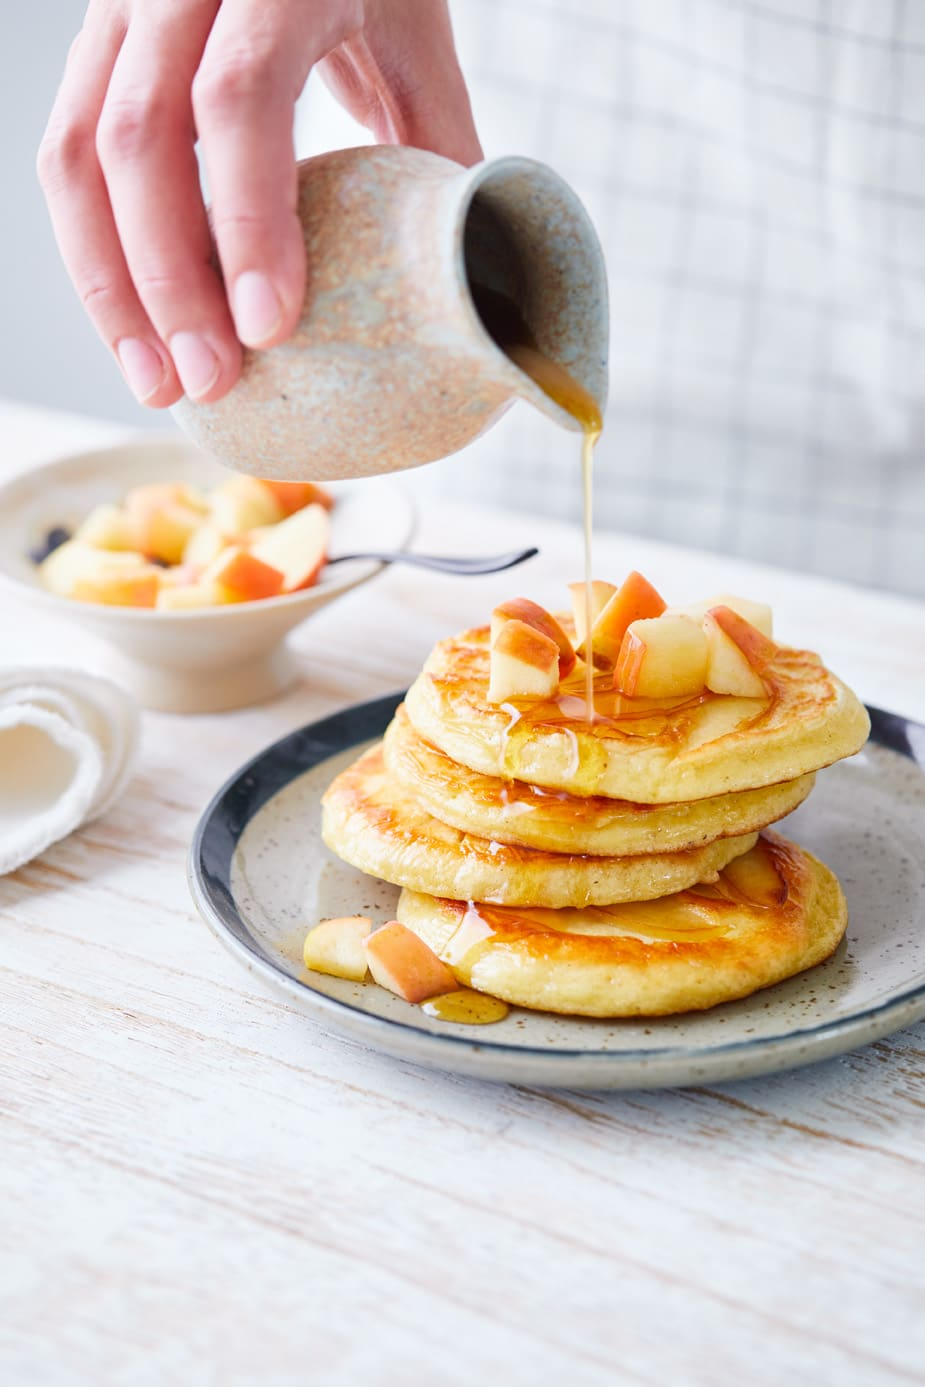 Photo of Apple & cinnamon pancakes by WW